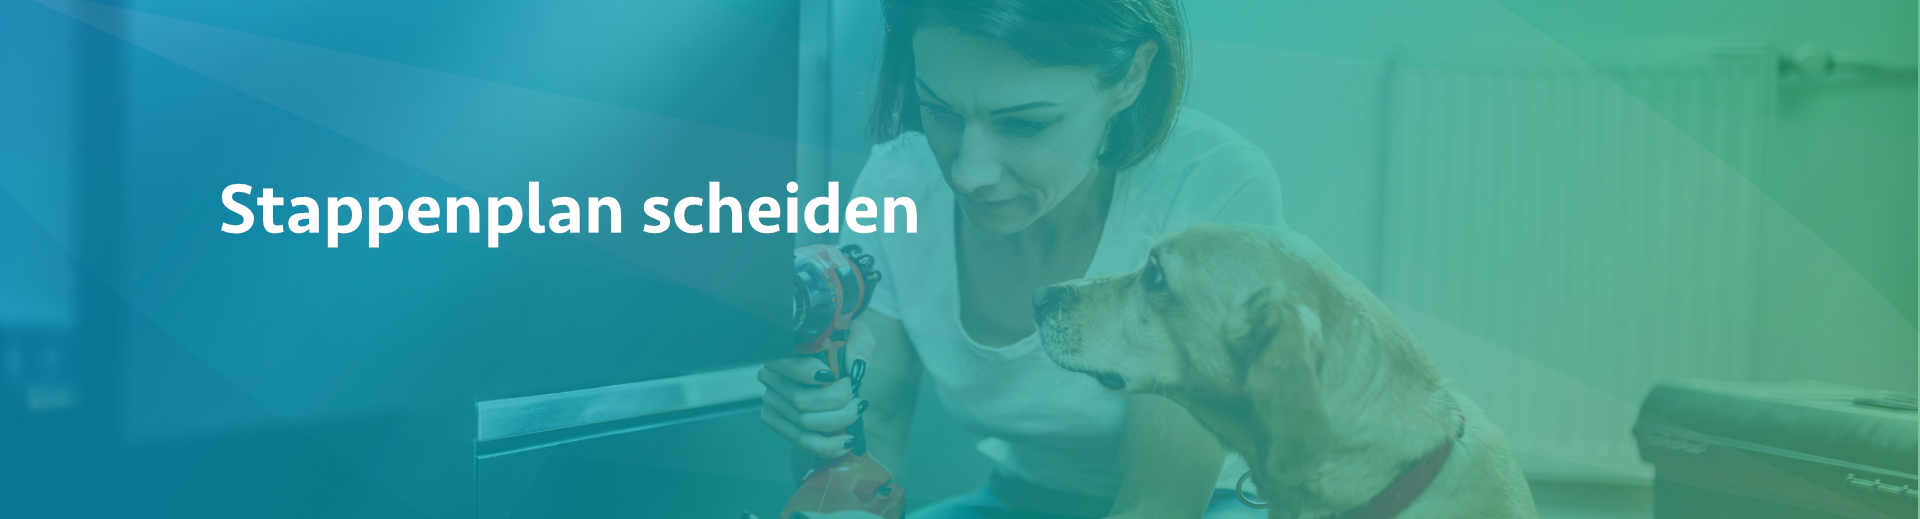 Stappenplan echtscheiding - Scheidingsplanner Hilversum - Bilthoven - Soest - Het Gooi